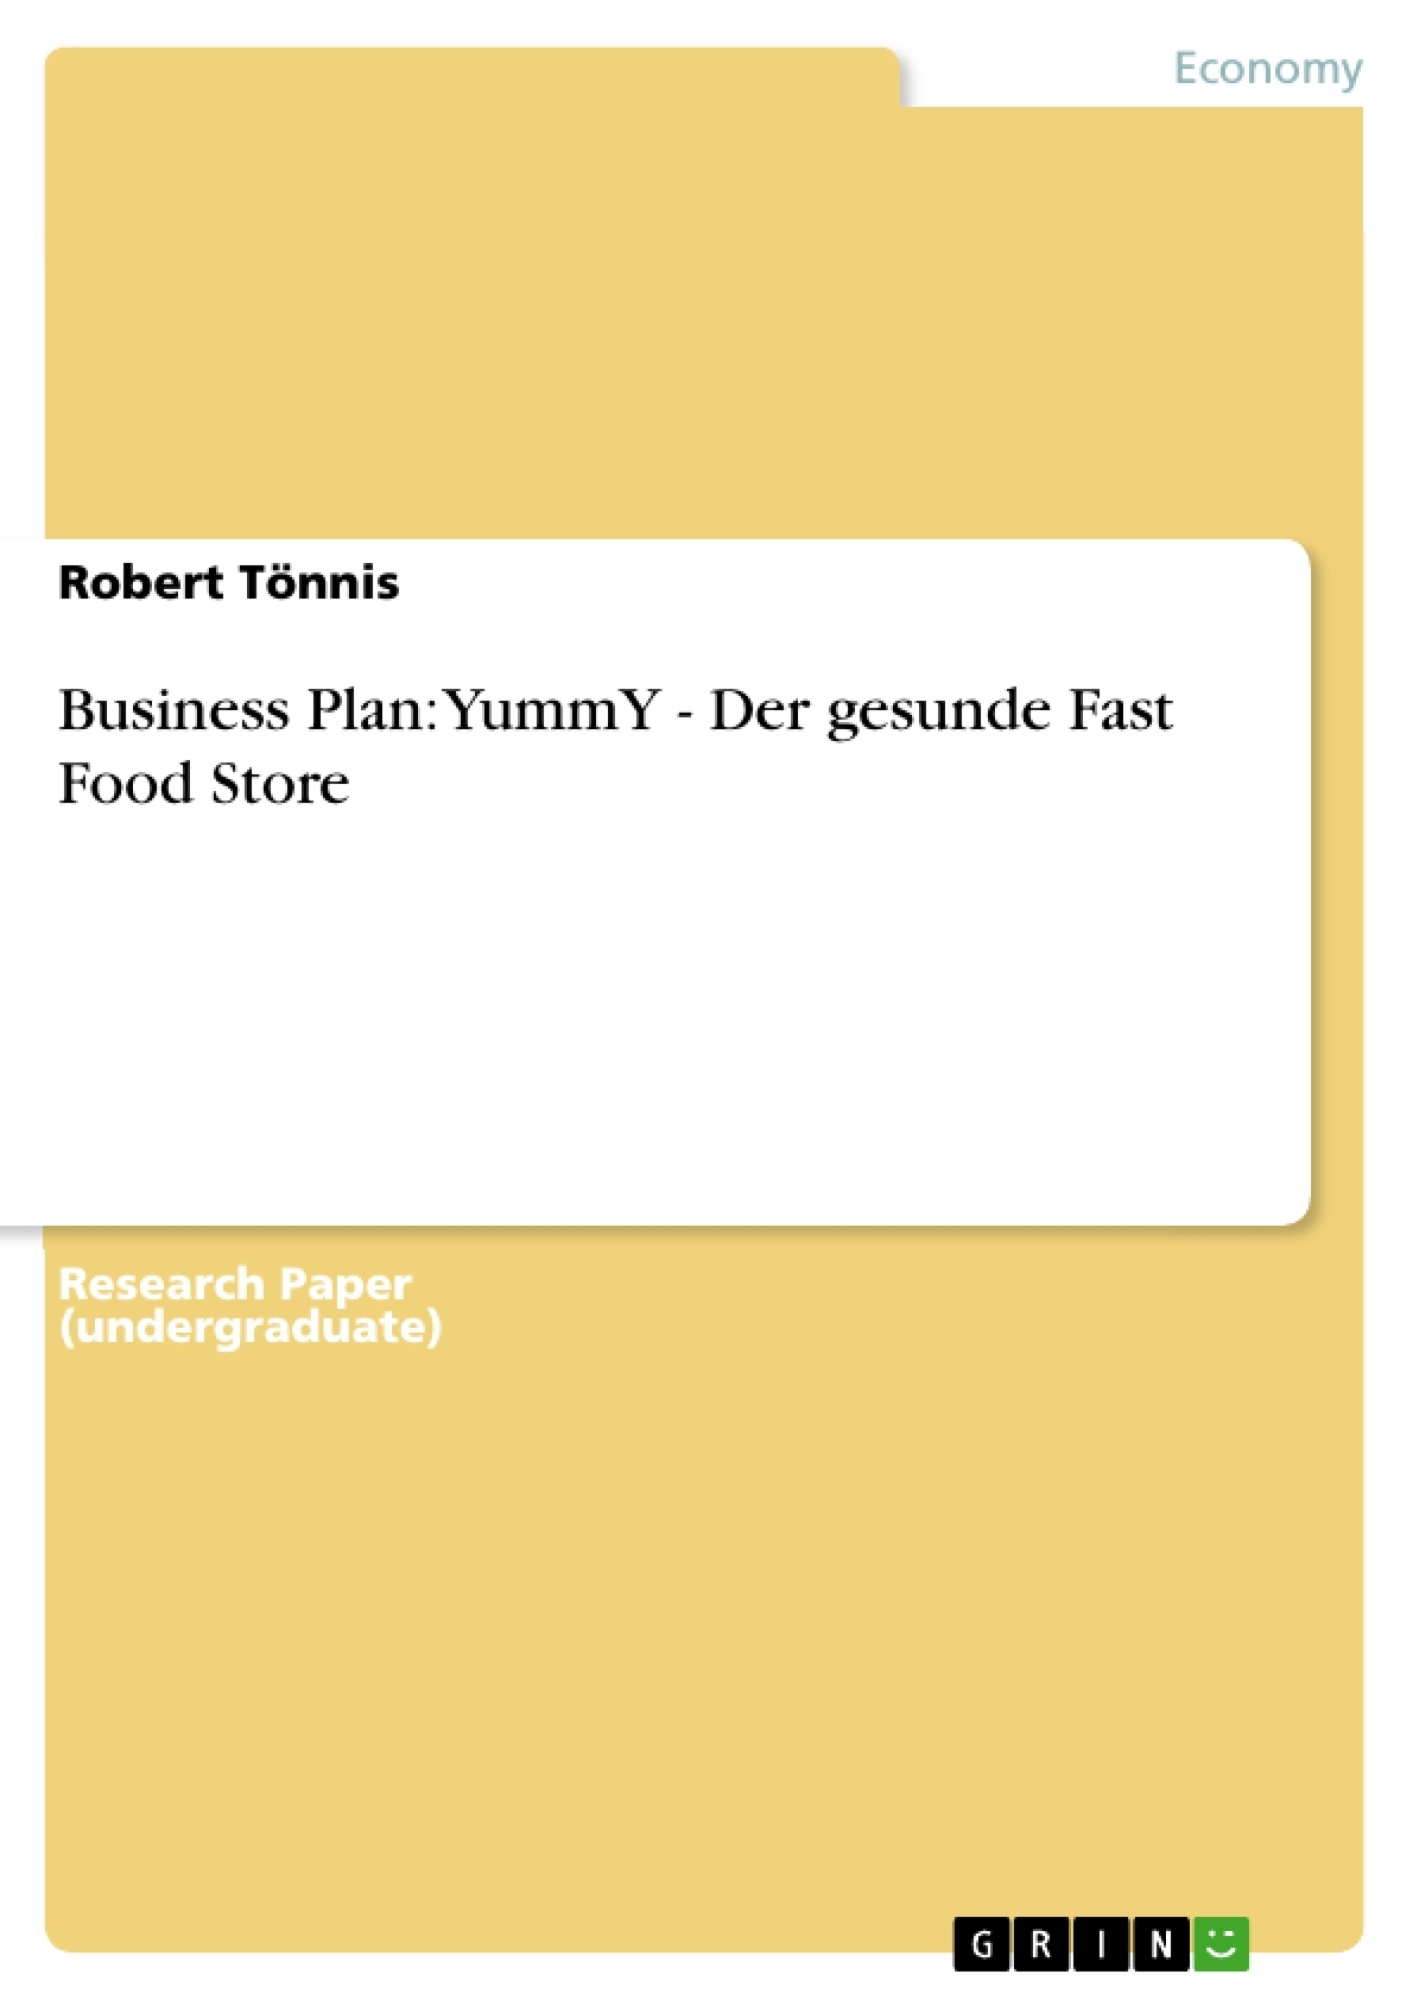 Title: Business Plan: YummY - Der gesunde Fast Food Store